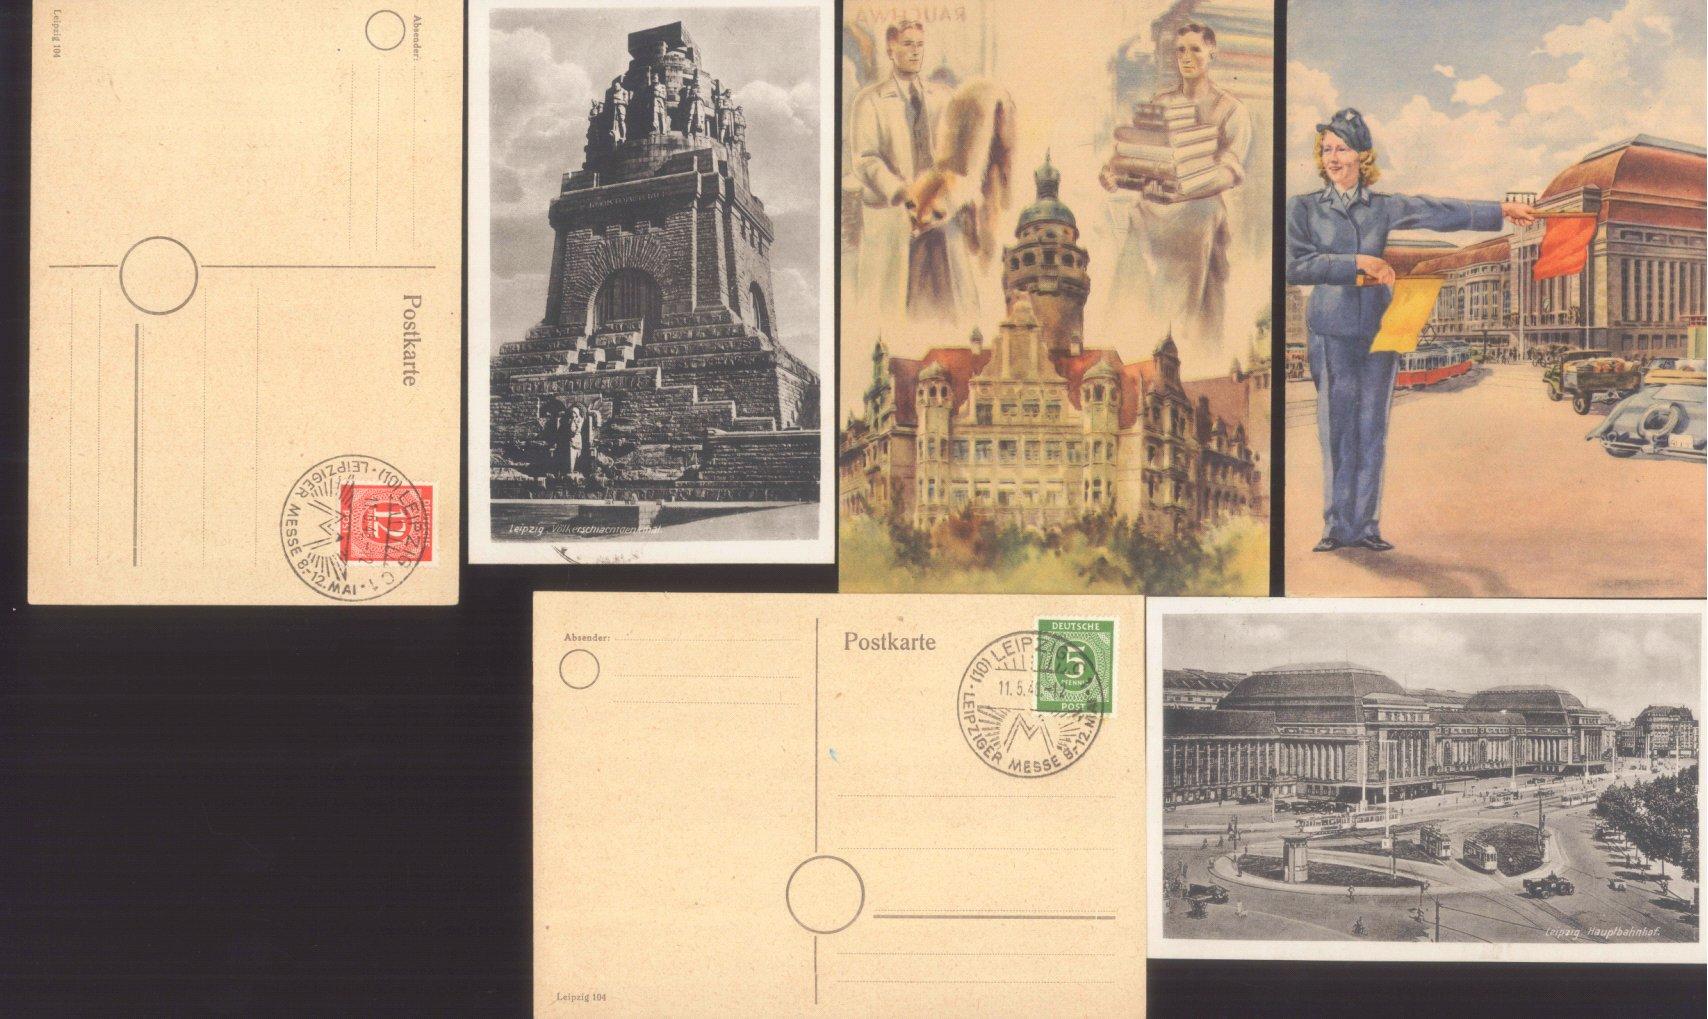 MOTIV LEIPZIGER MESSE 1946